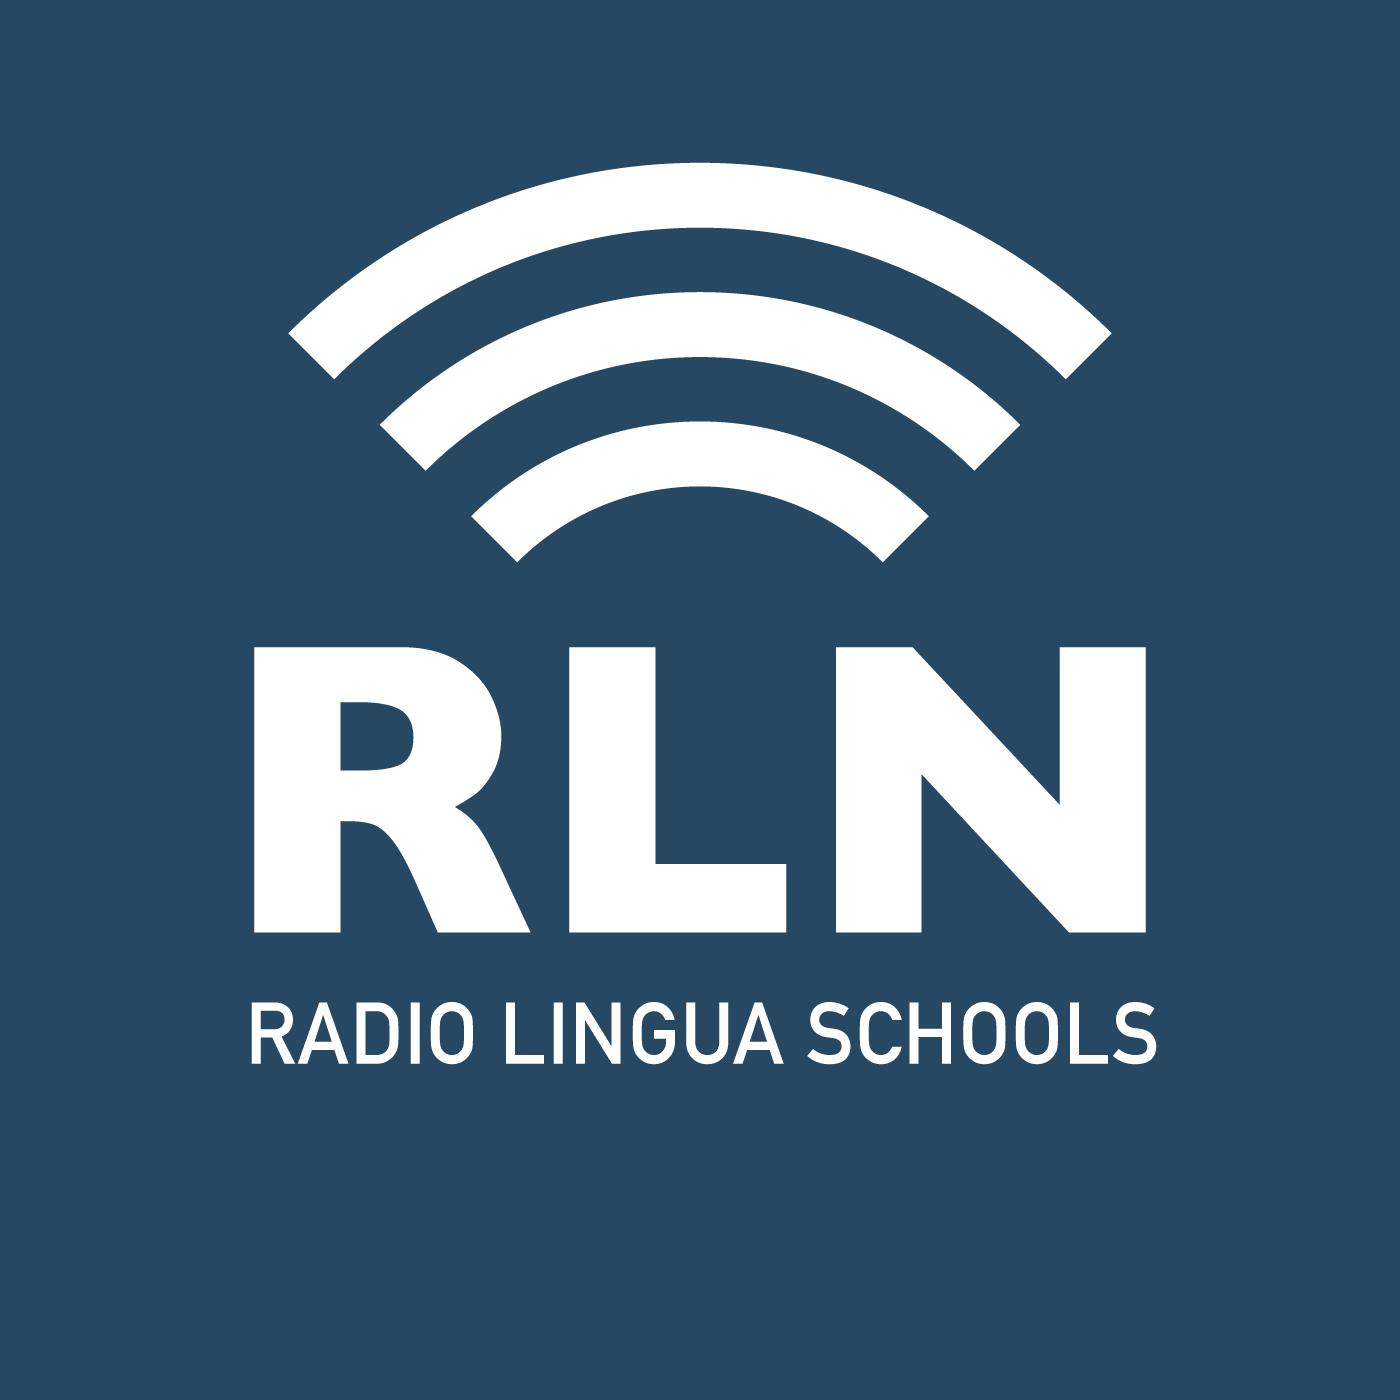 Radio Lingua Schools